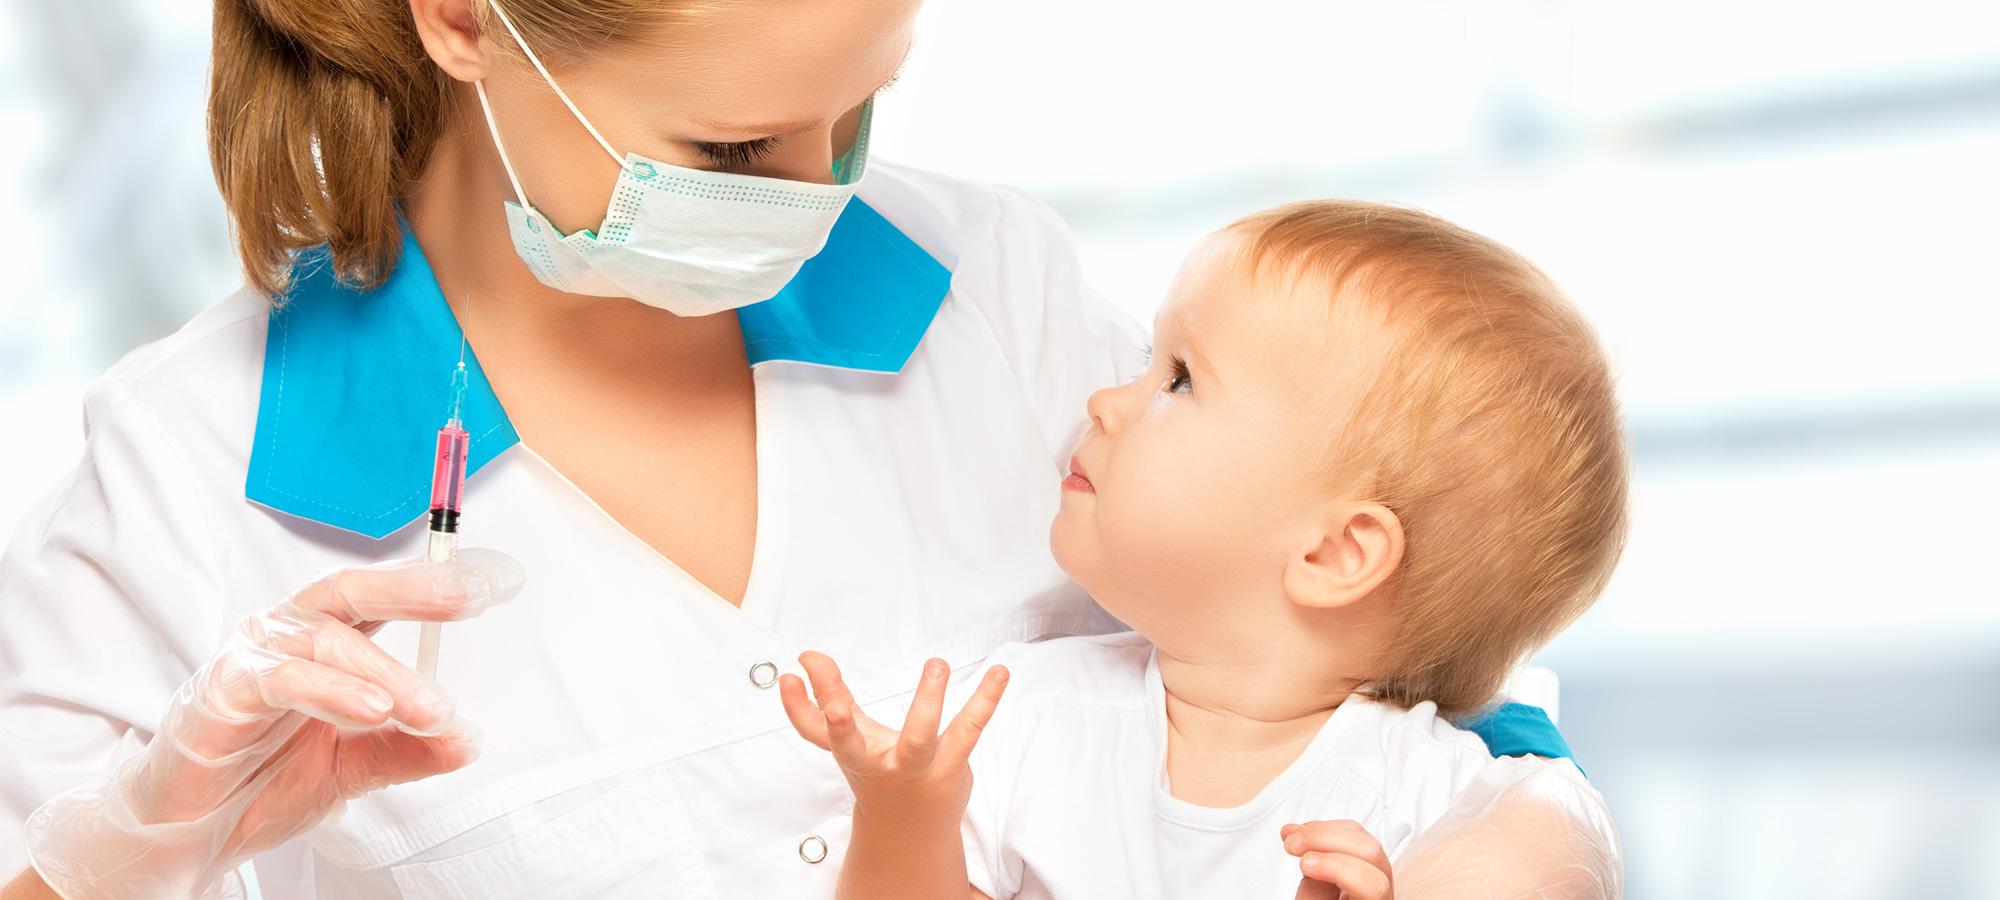 Pediatric Infectious Diseases Photo